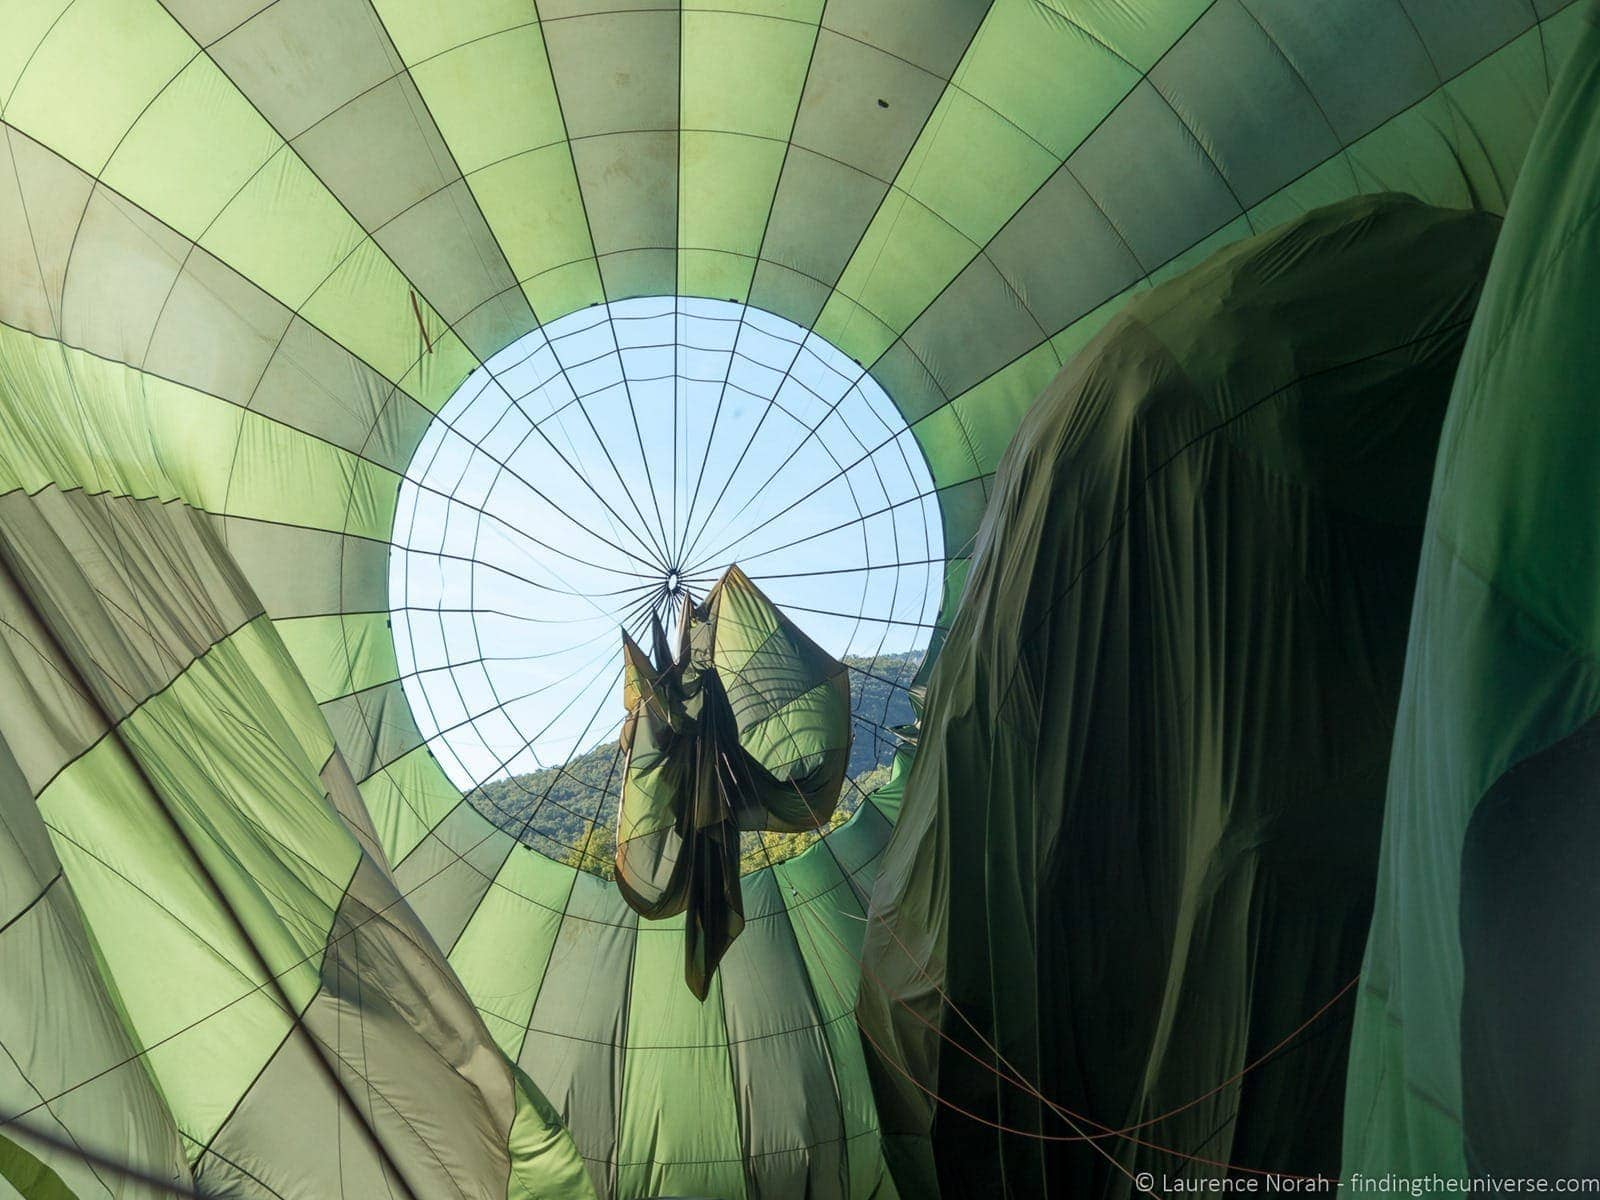 Balloon Vol de Coloms Costa Brava 34